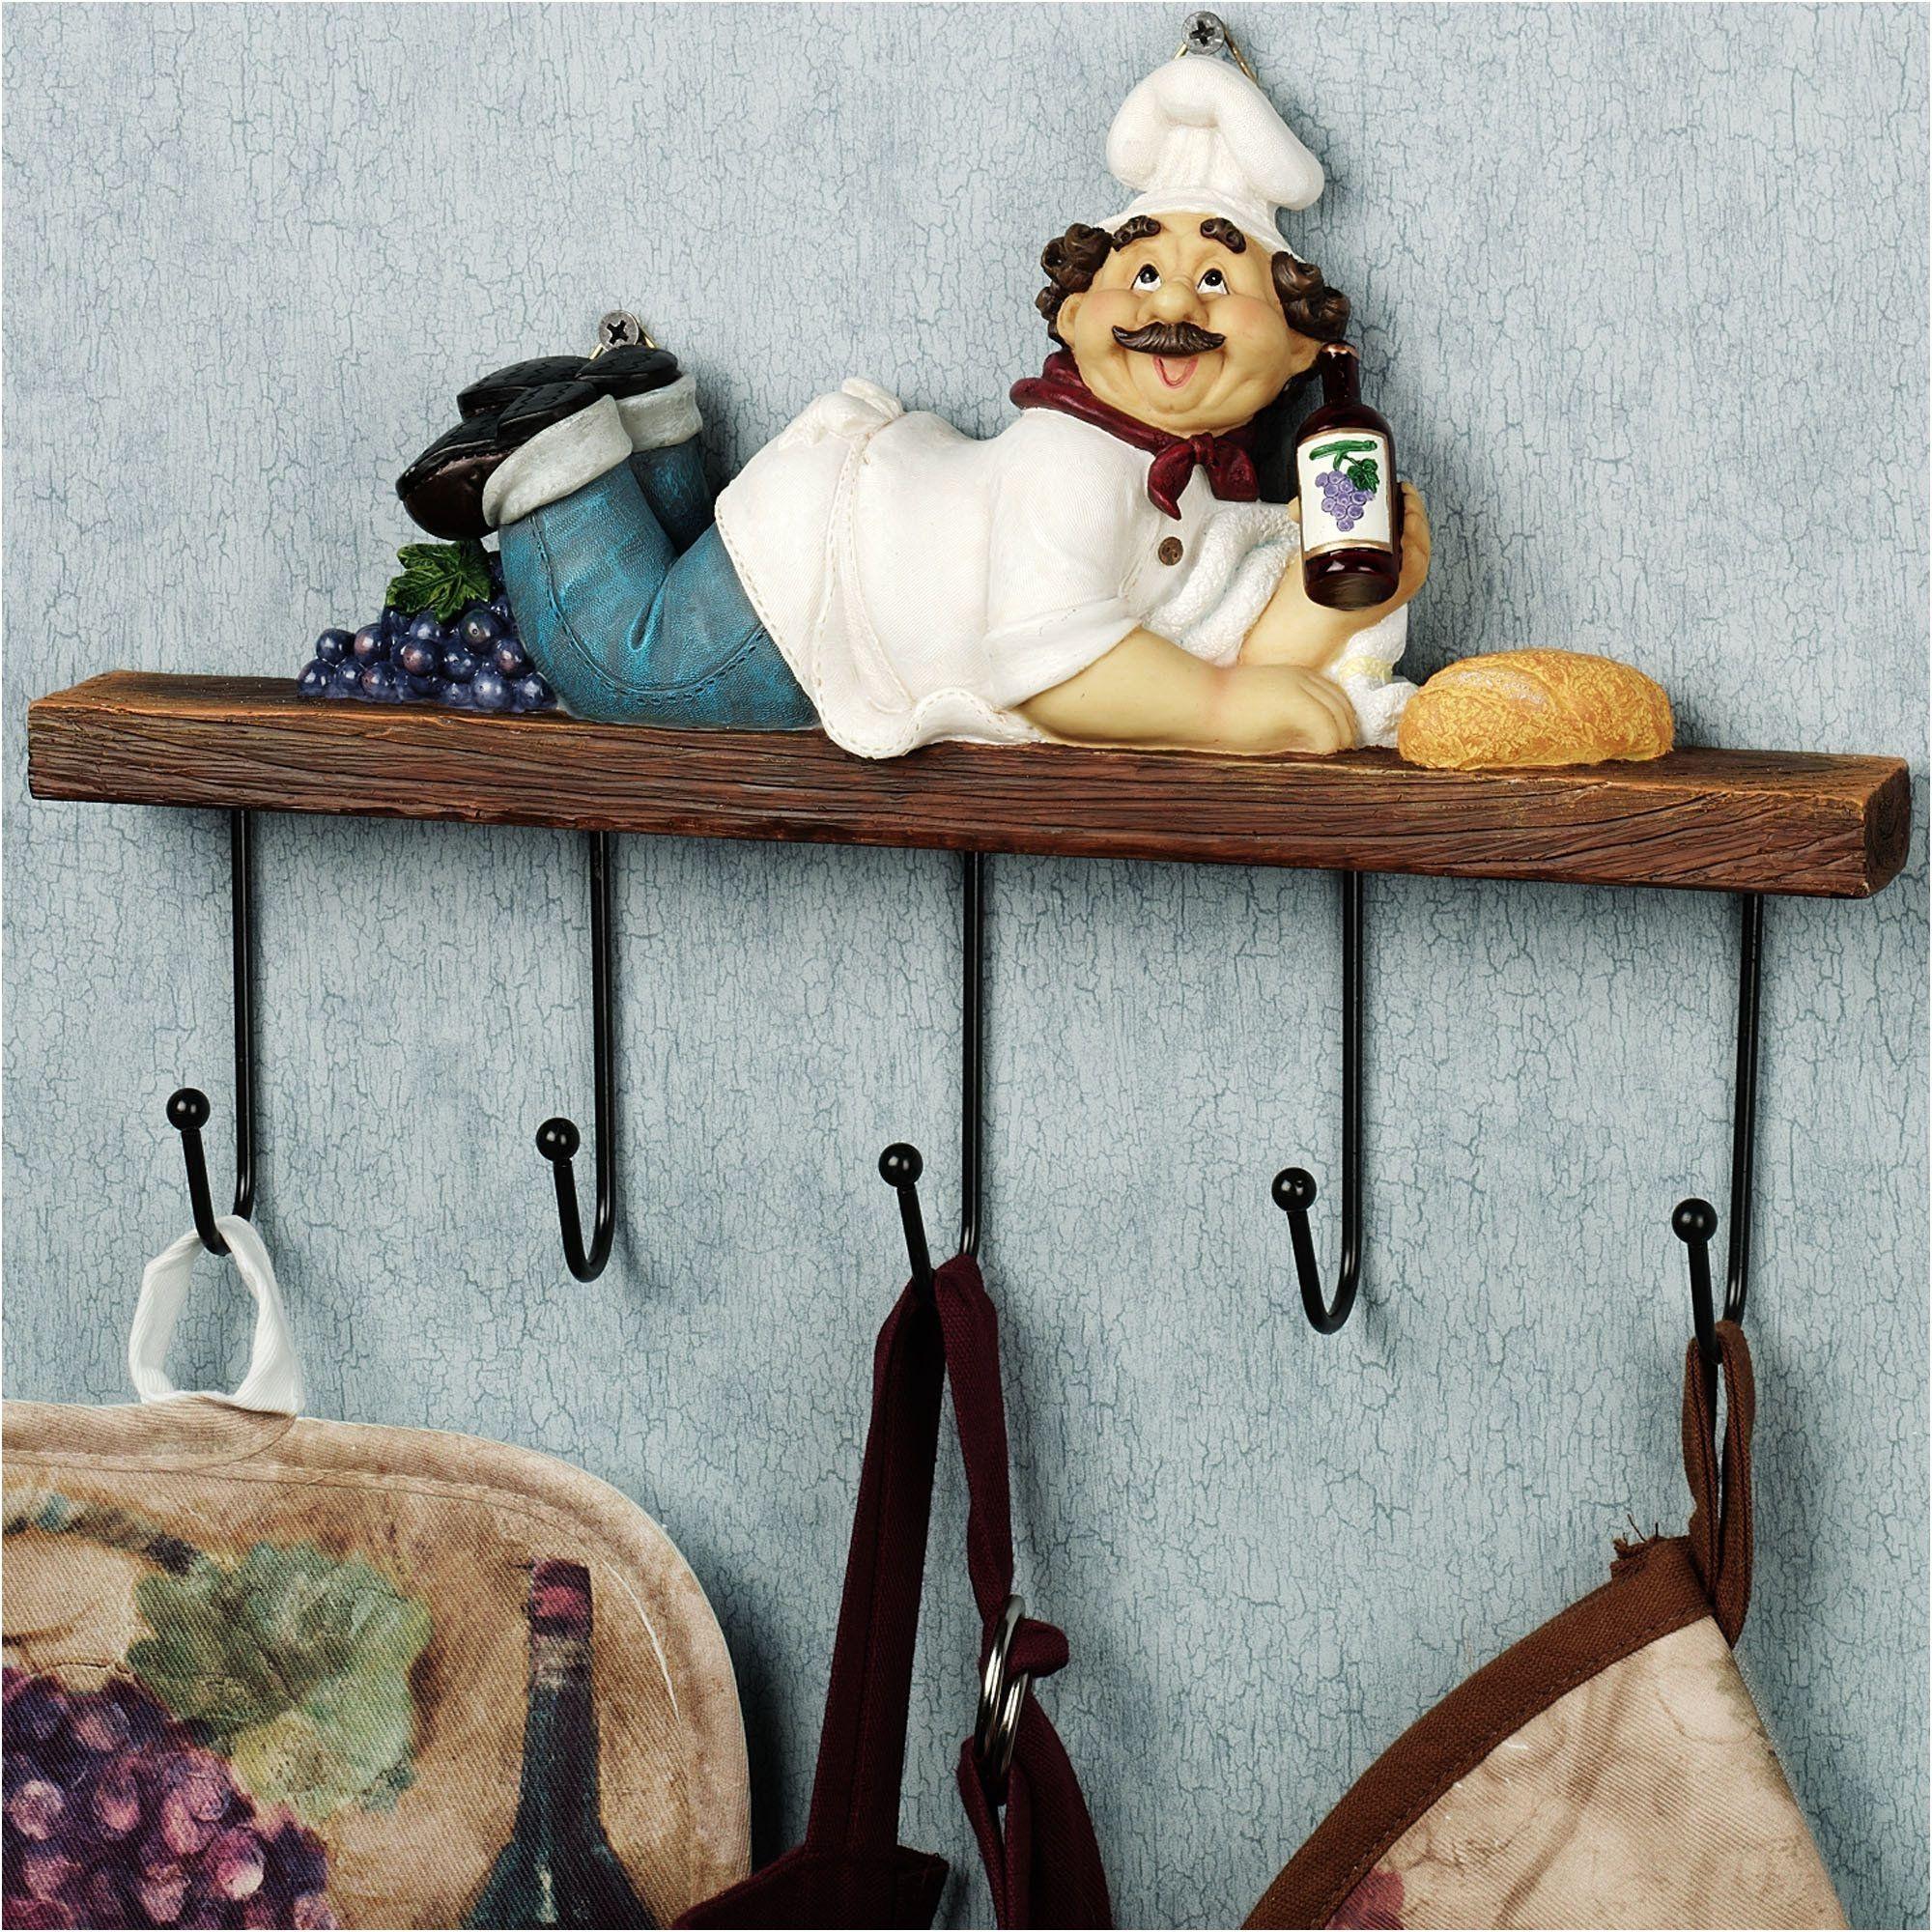 chef kitchen accessories decor kitchen decor design ideas from Chef ...